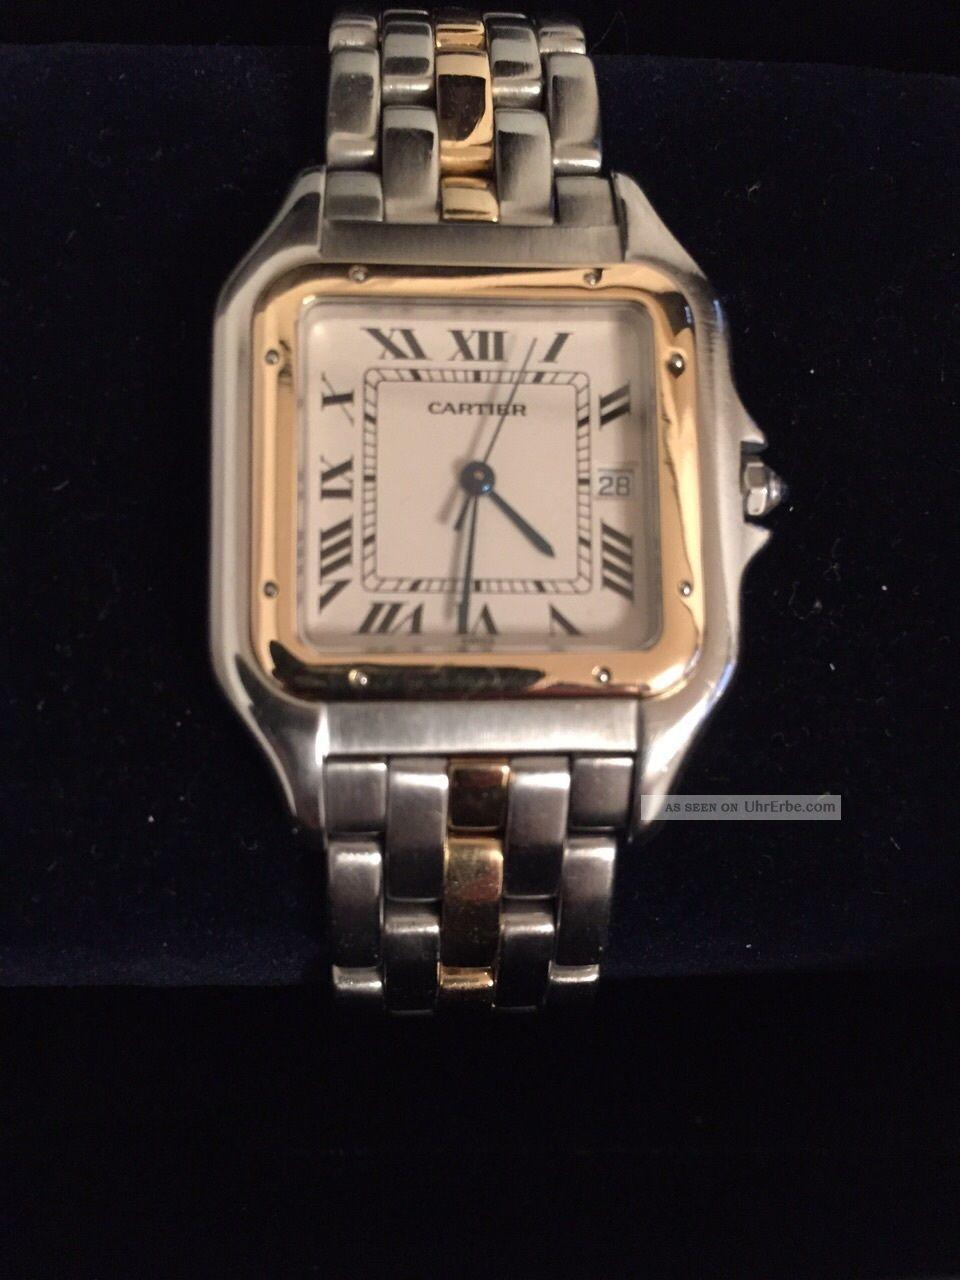 Cartier Damen - /herrenuhr Panthere18k Stahl Gold,  Großes Modell Armbanduhren Bild